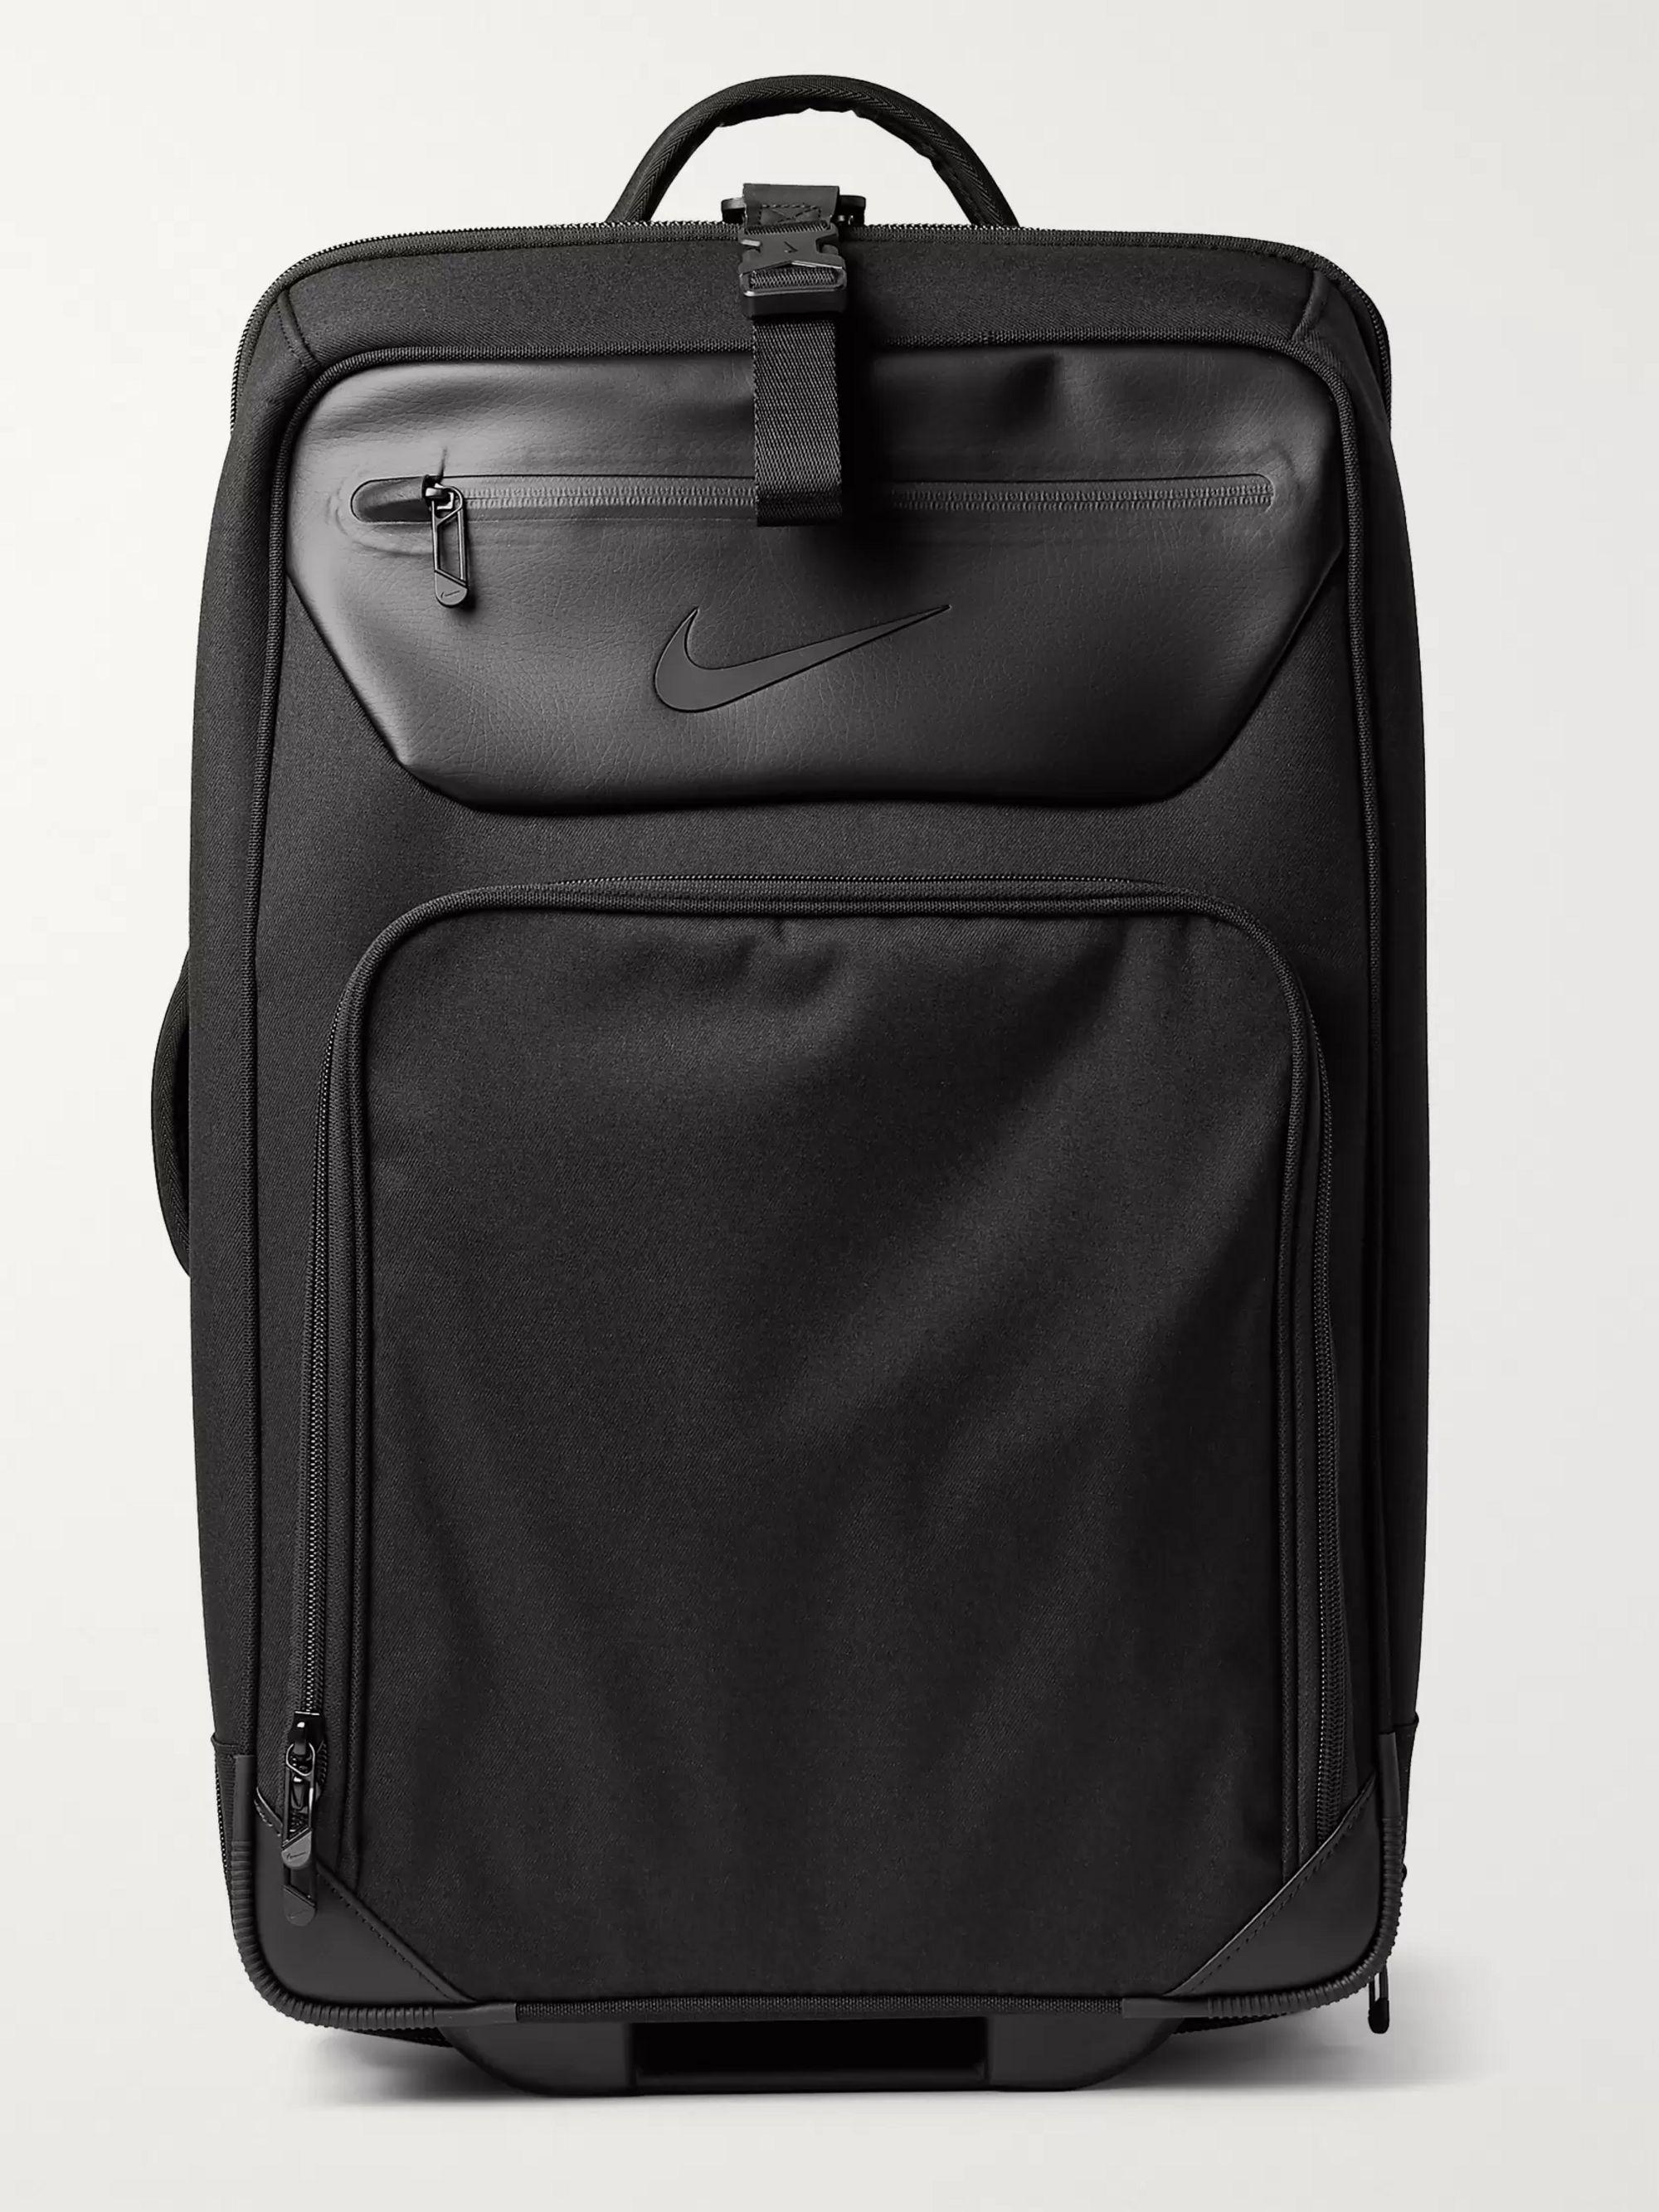 Nike Golf Departure Neoprene Suitcase